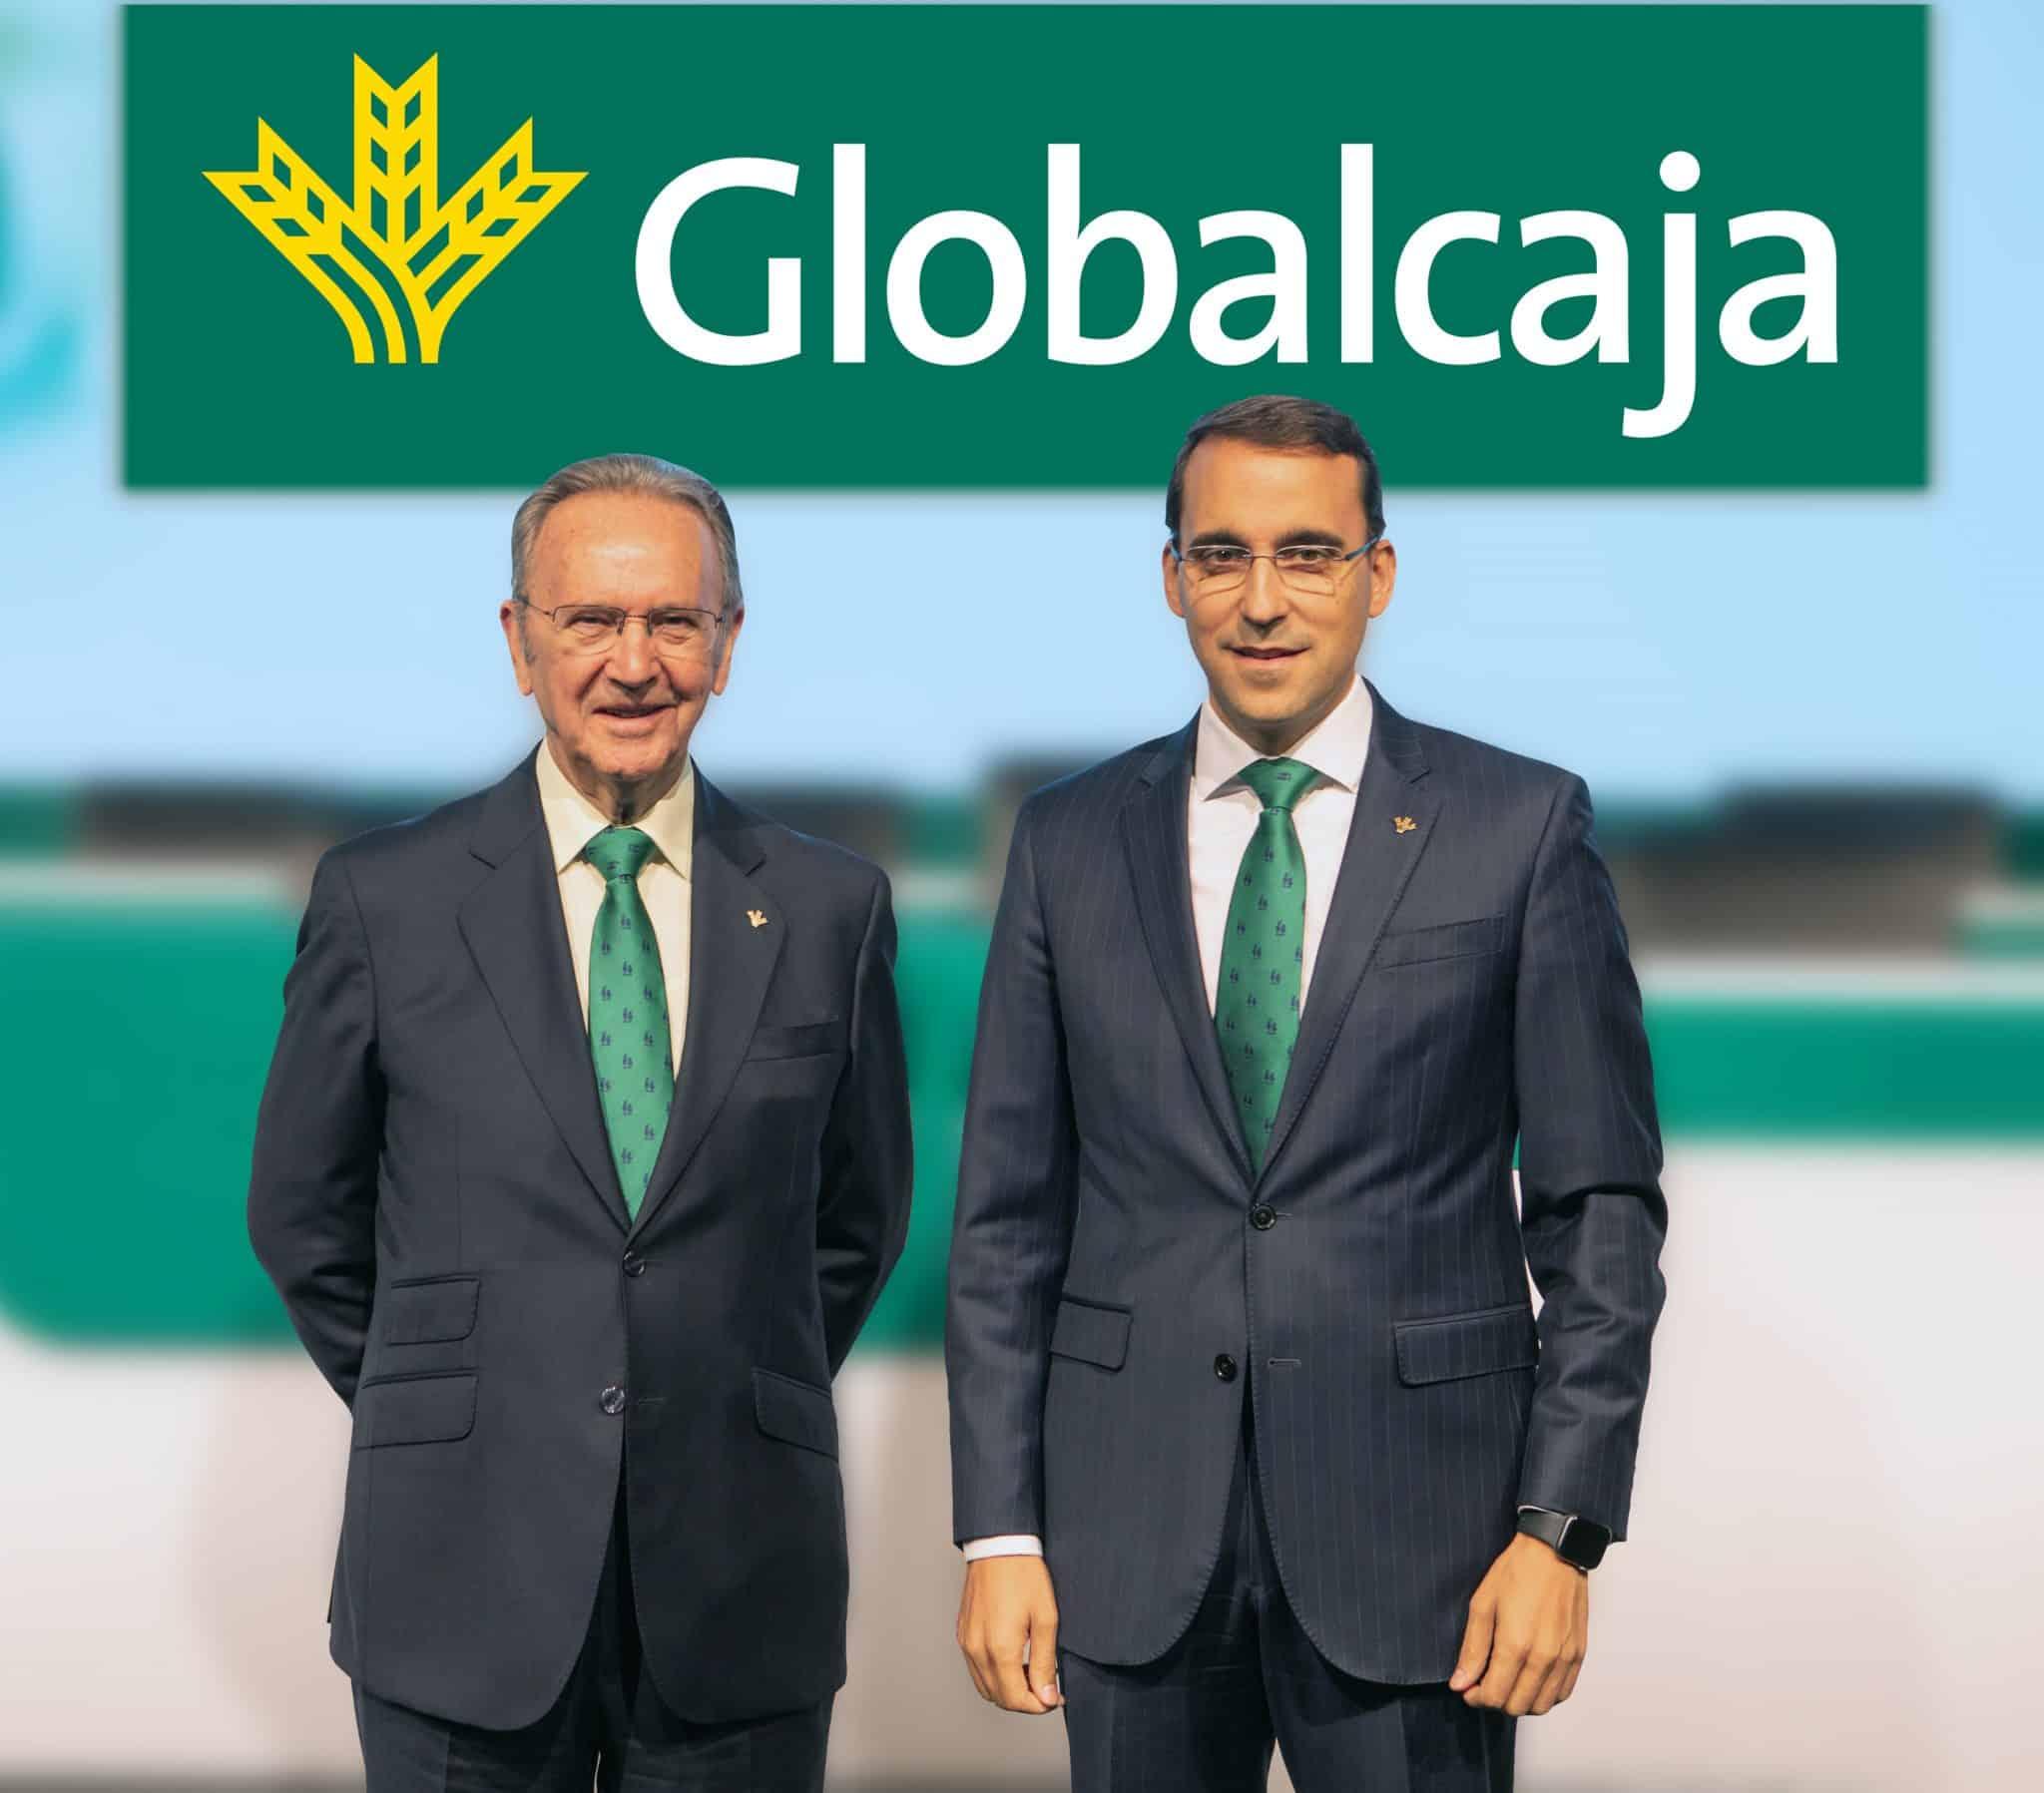 https://blog.globalcaja.es/wp-content/uploads/2020/03/FOTO-FONDOS-SOLIDARIOS.jpg